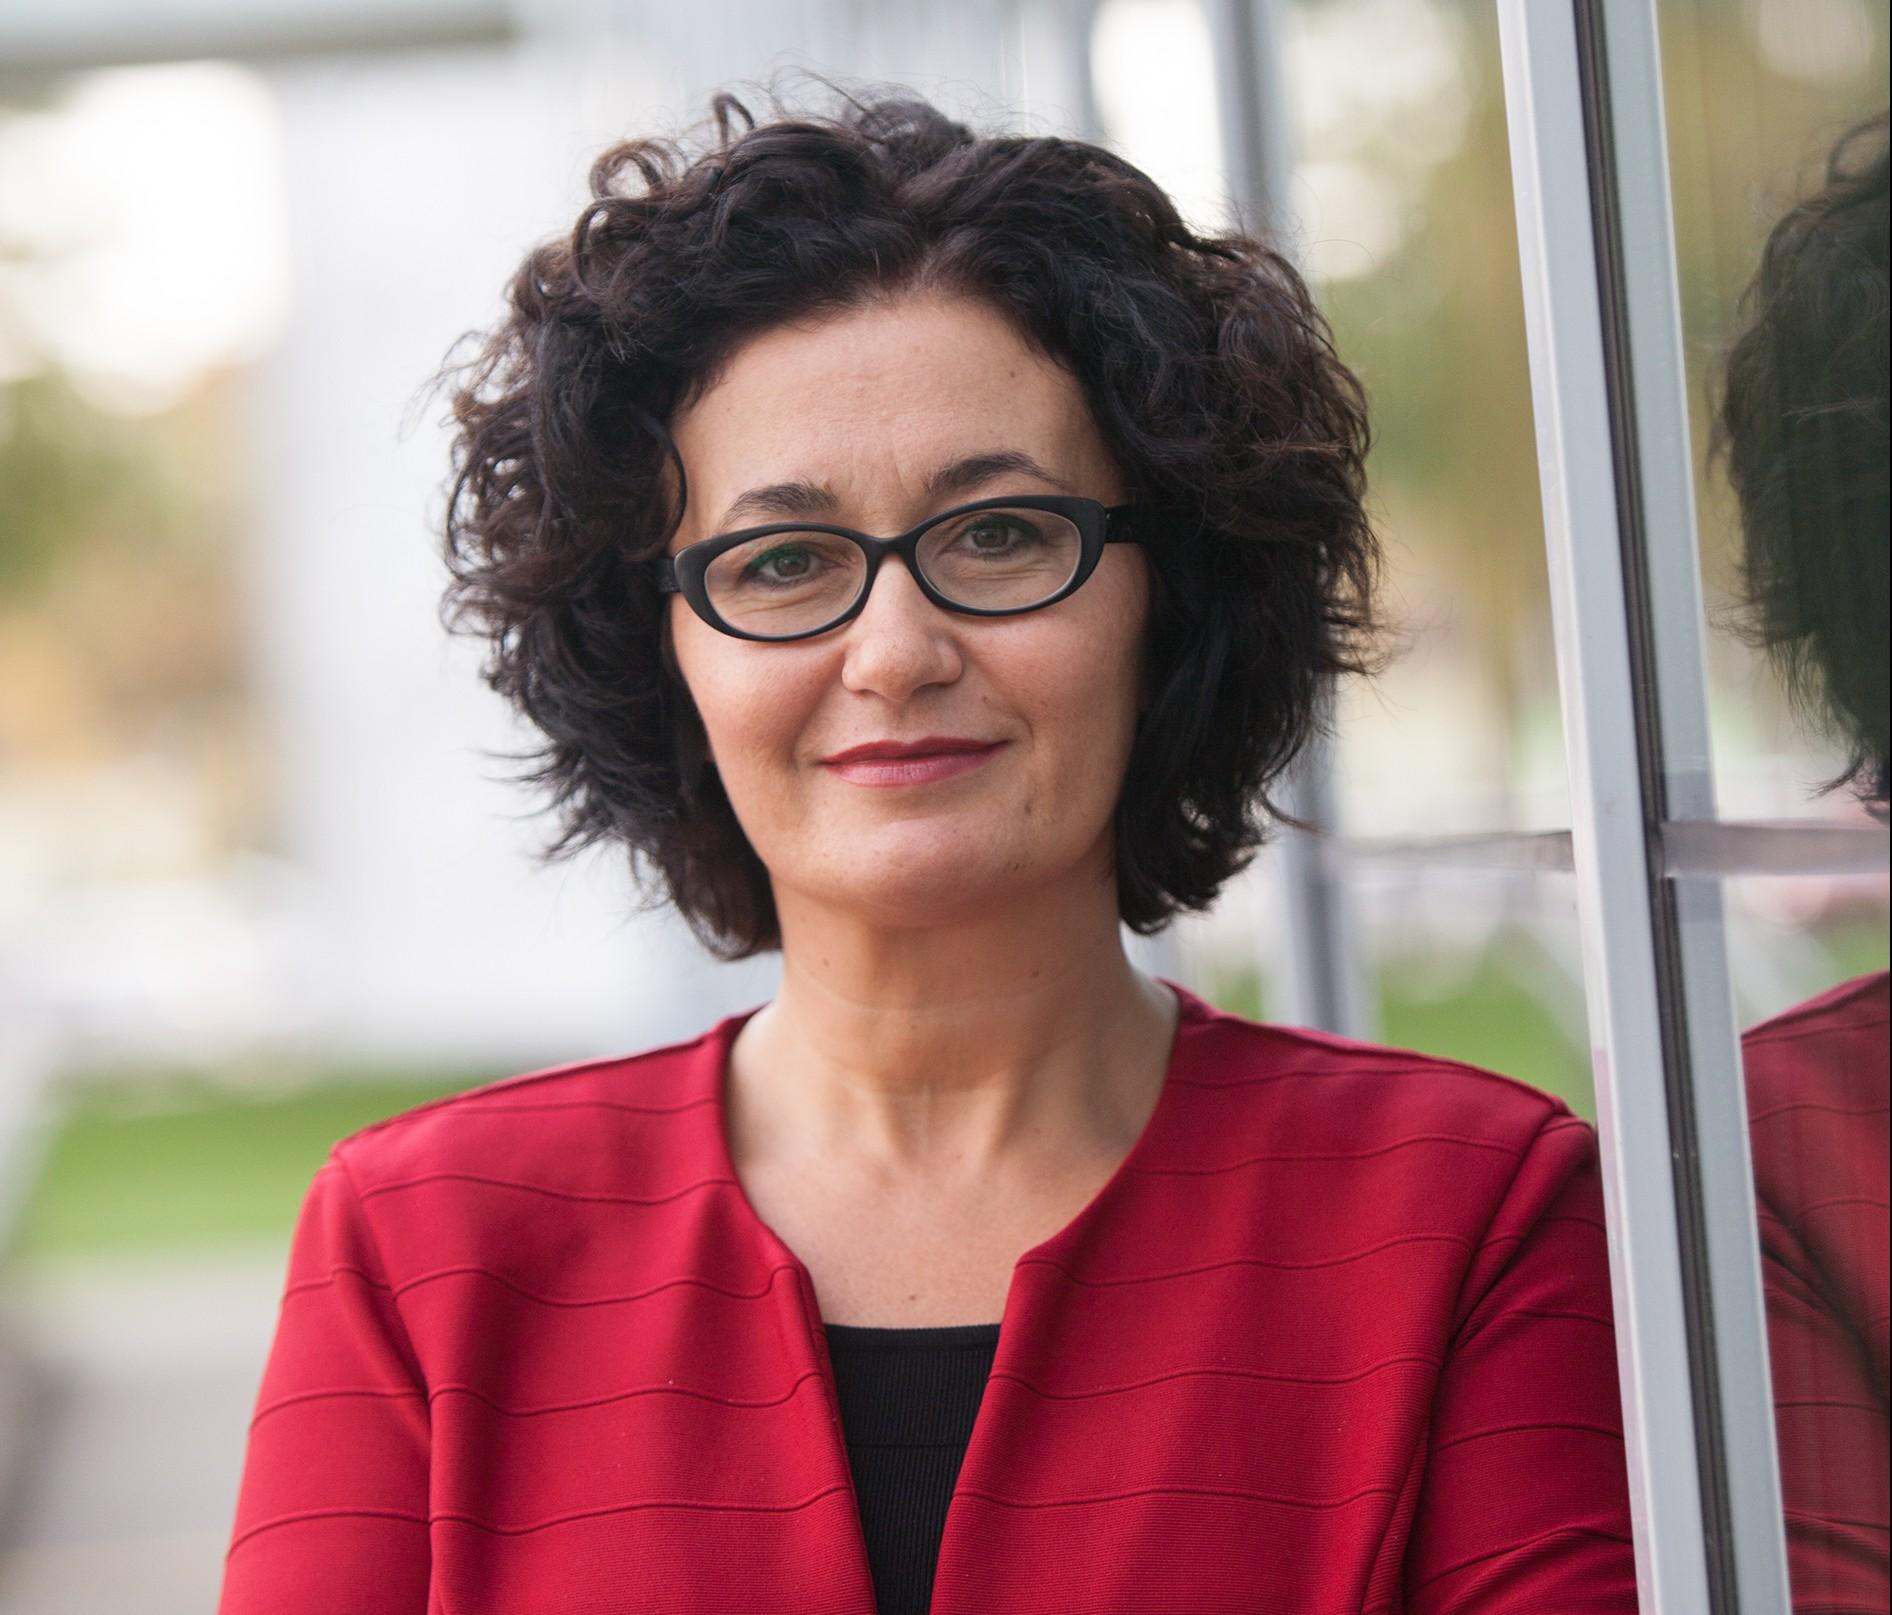 Ass.-Prof. Dr. Cristina Beretta M.A.